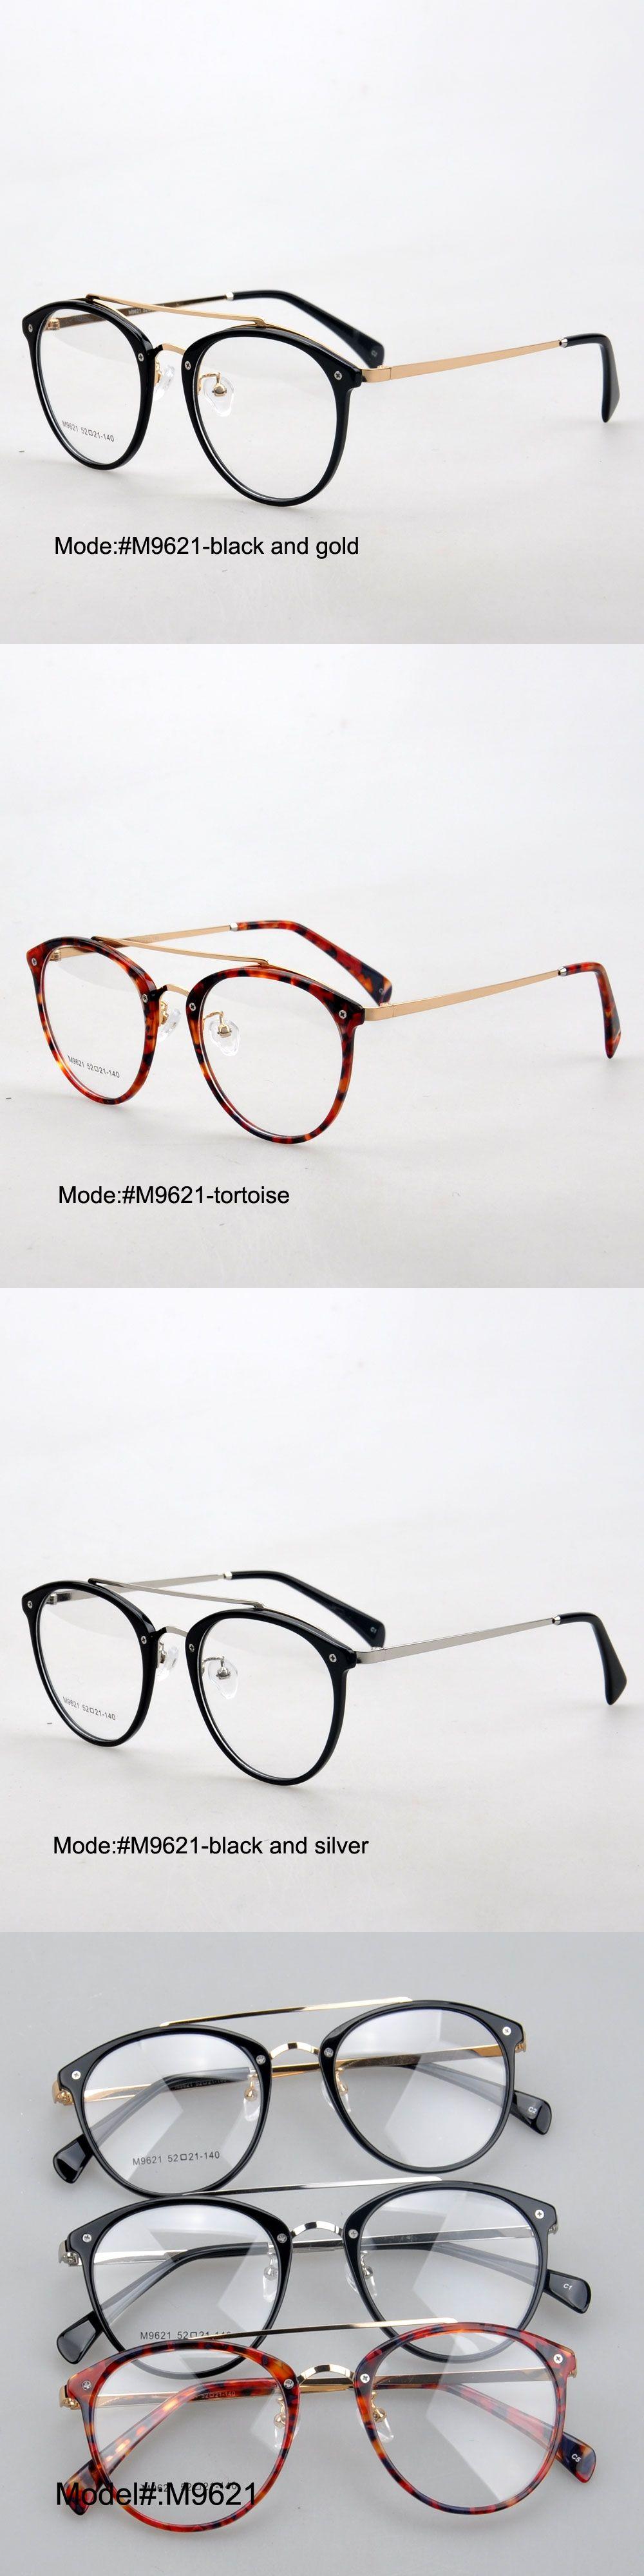 MY DOLI M9621 full rim unisex acetate and metal combination RX ...